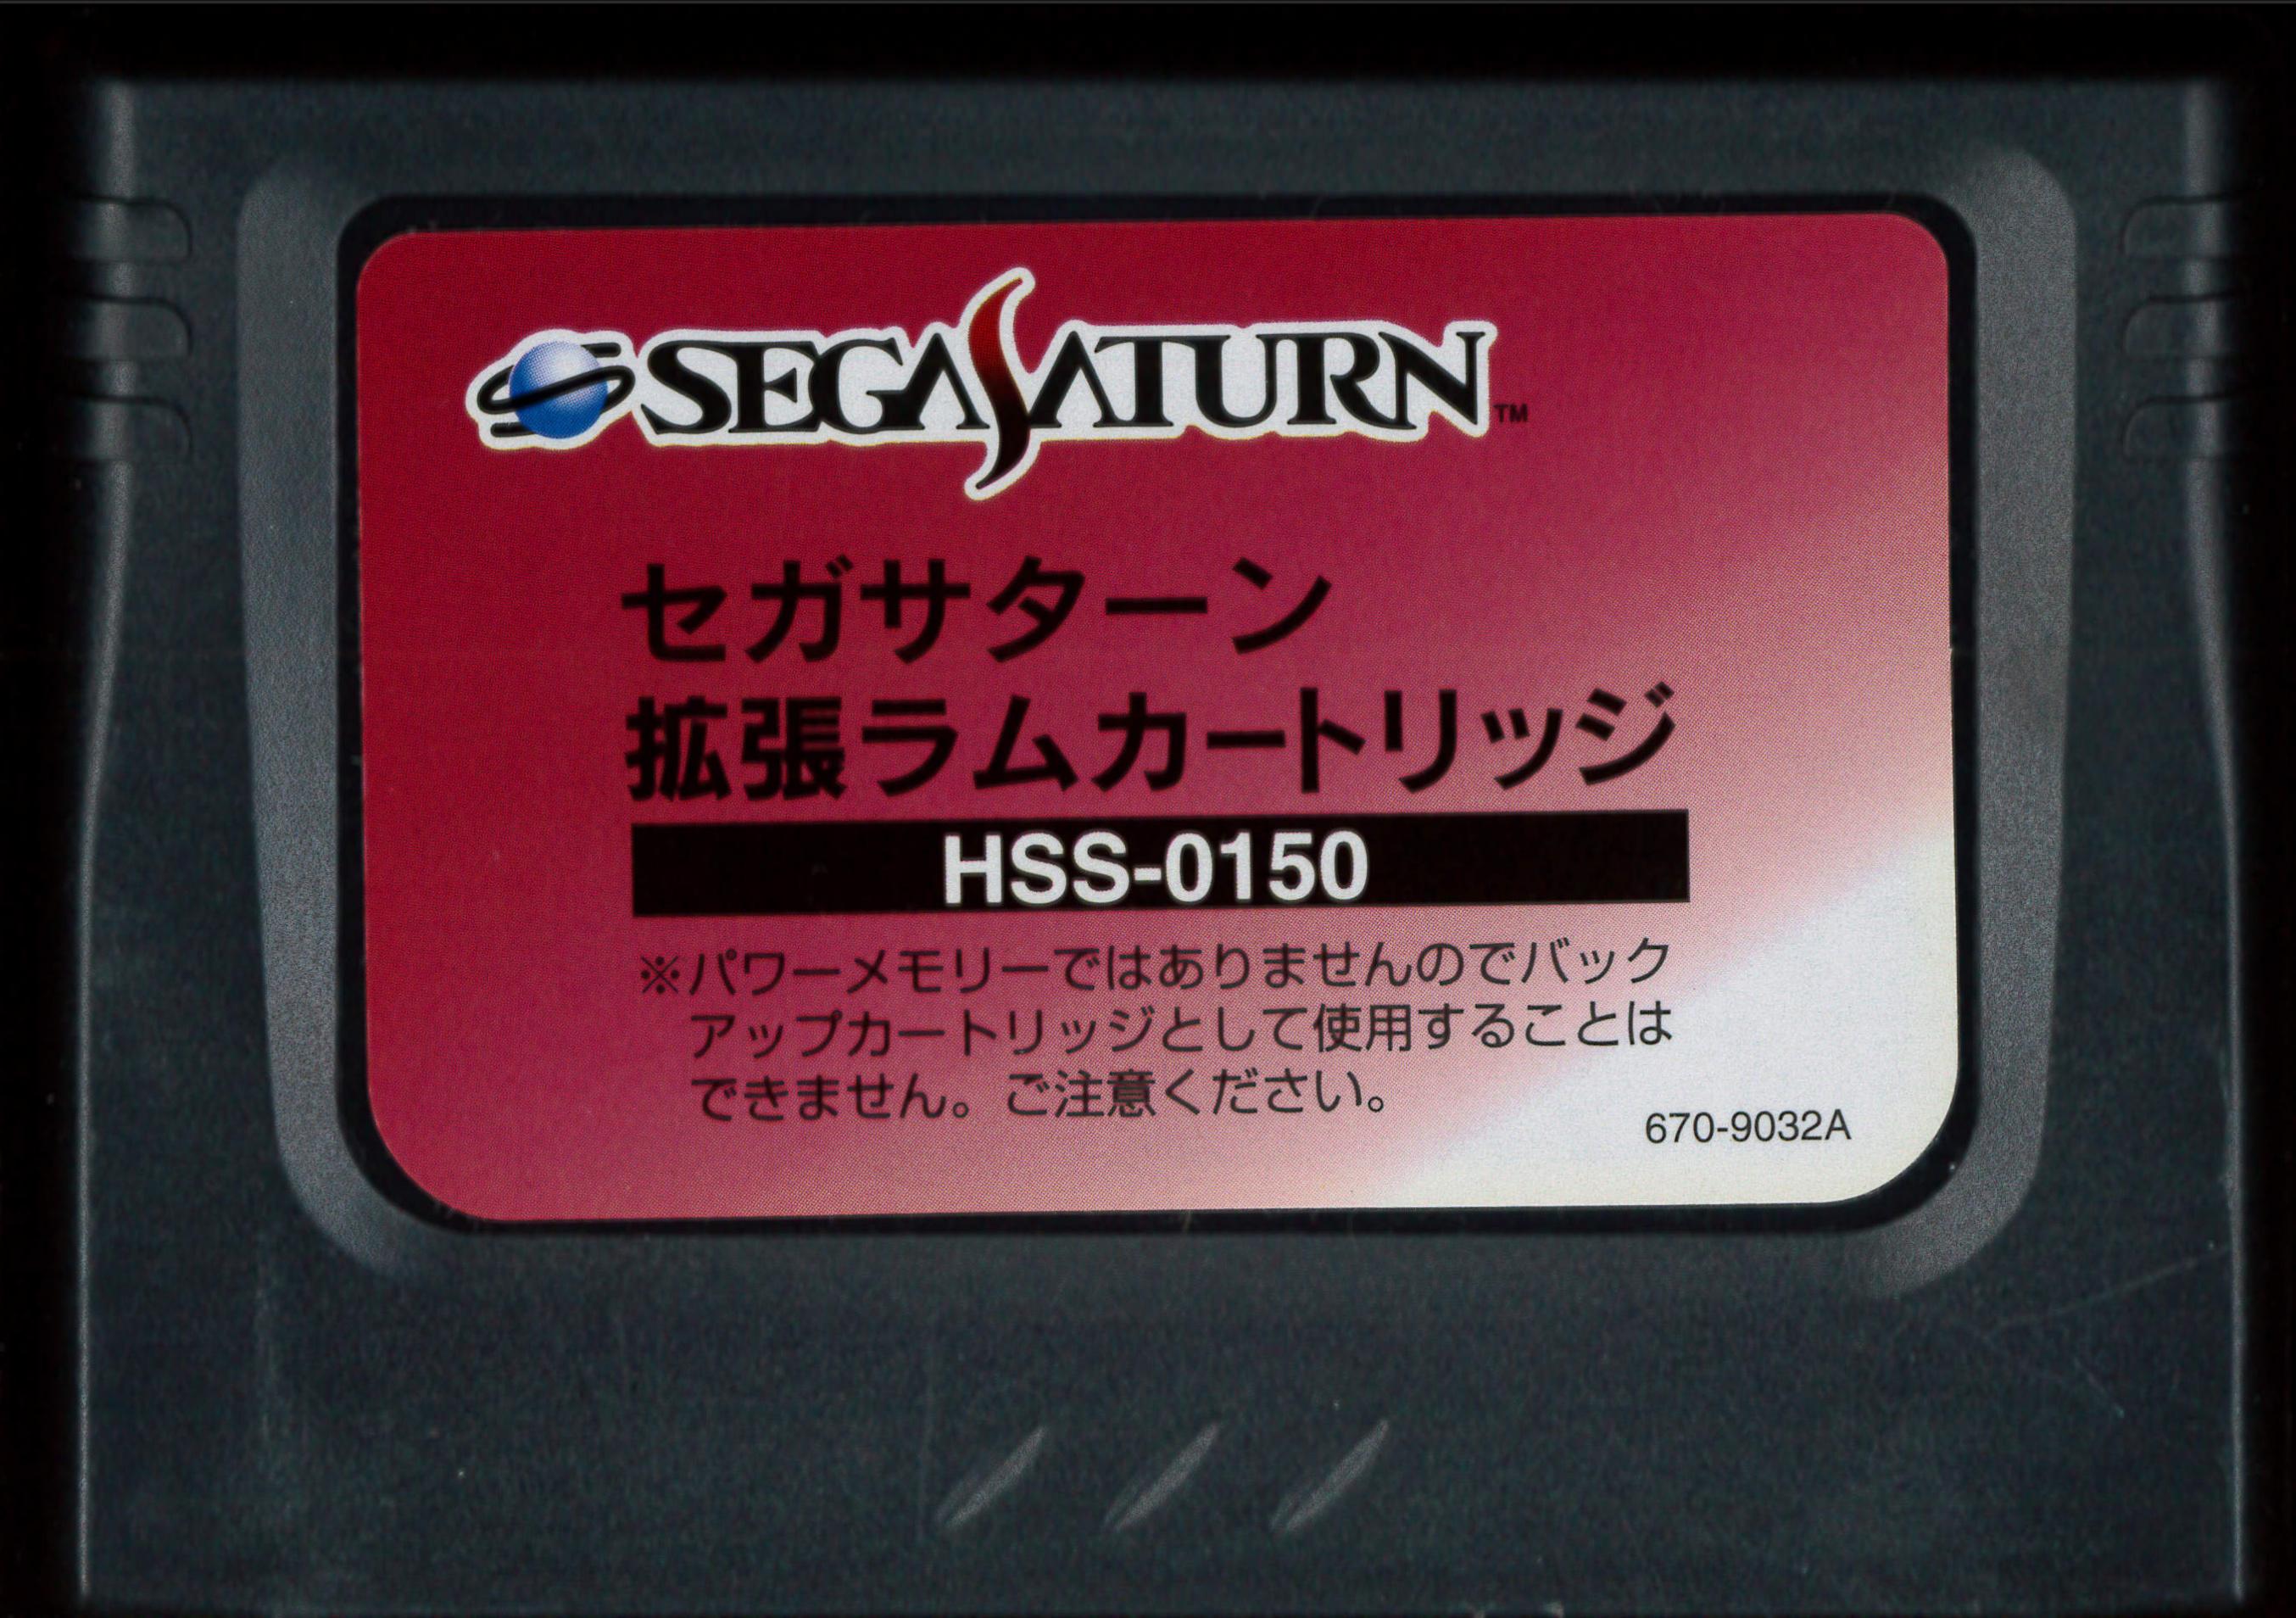 Sega Saturn - Historia[+PESADO][+MUITO PESADO!] Saturn_HSS-0150